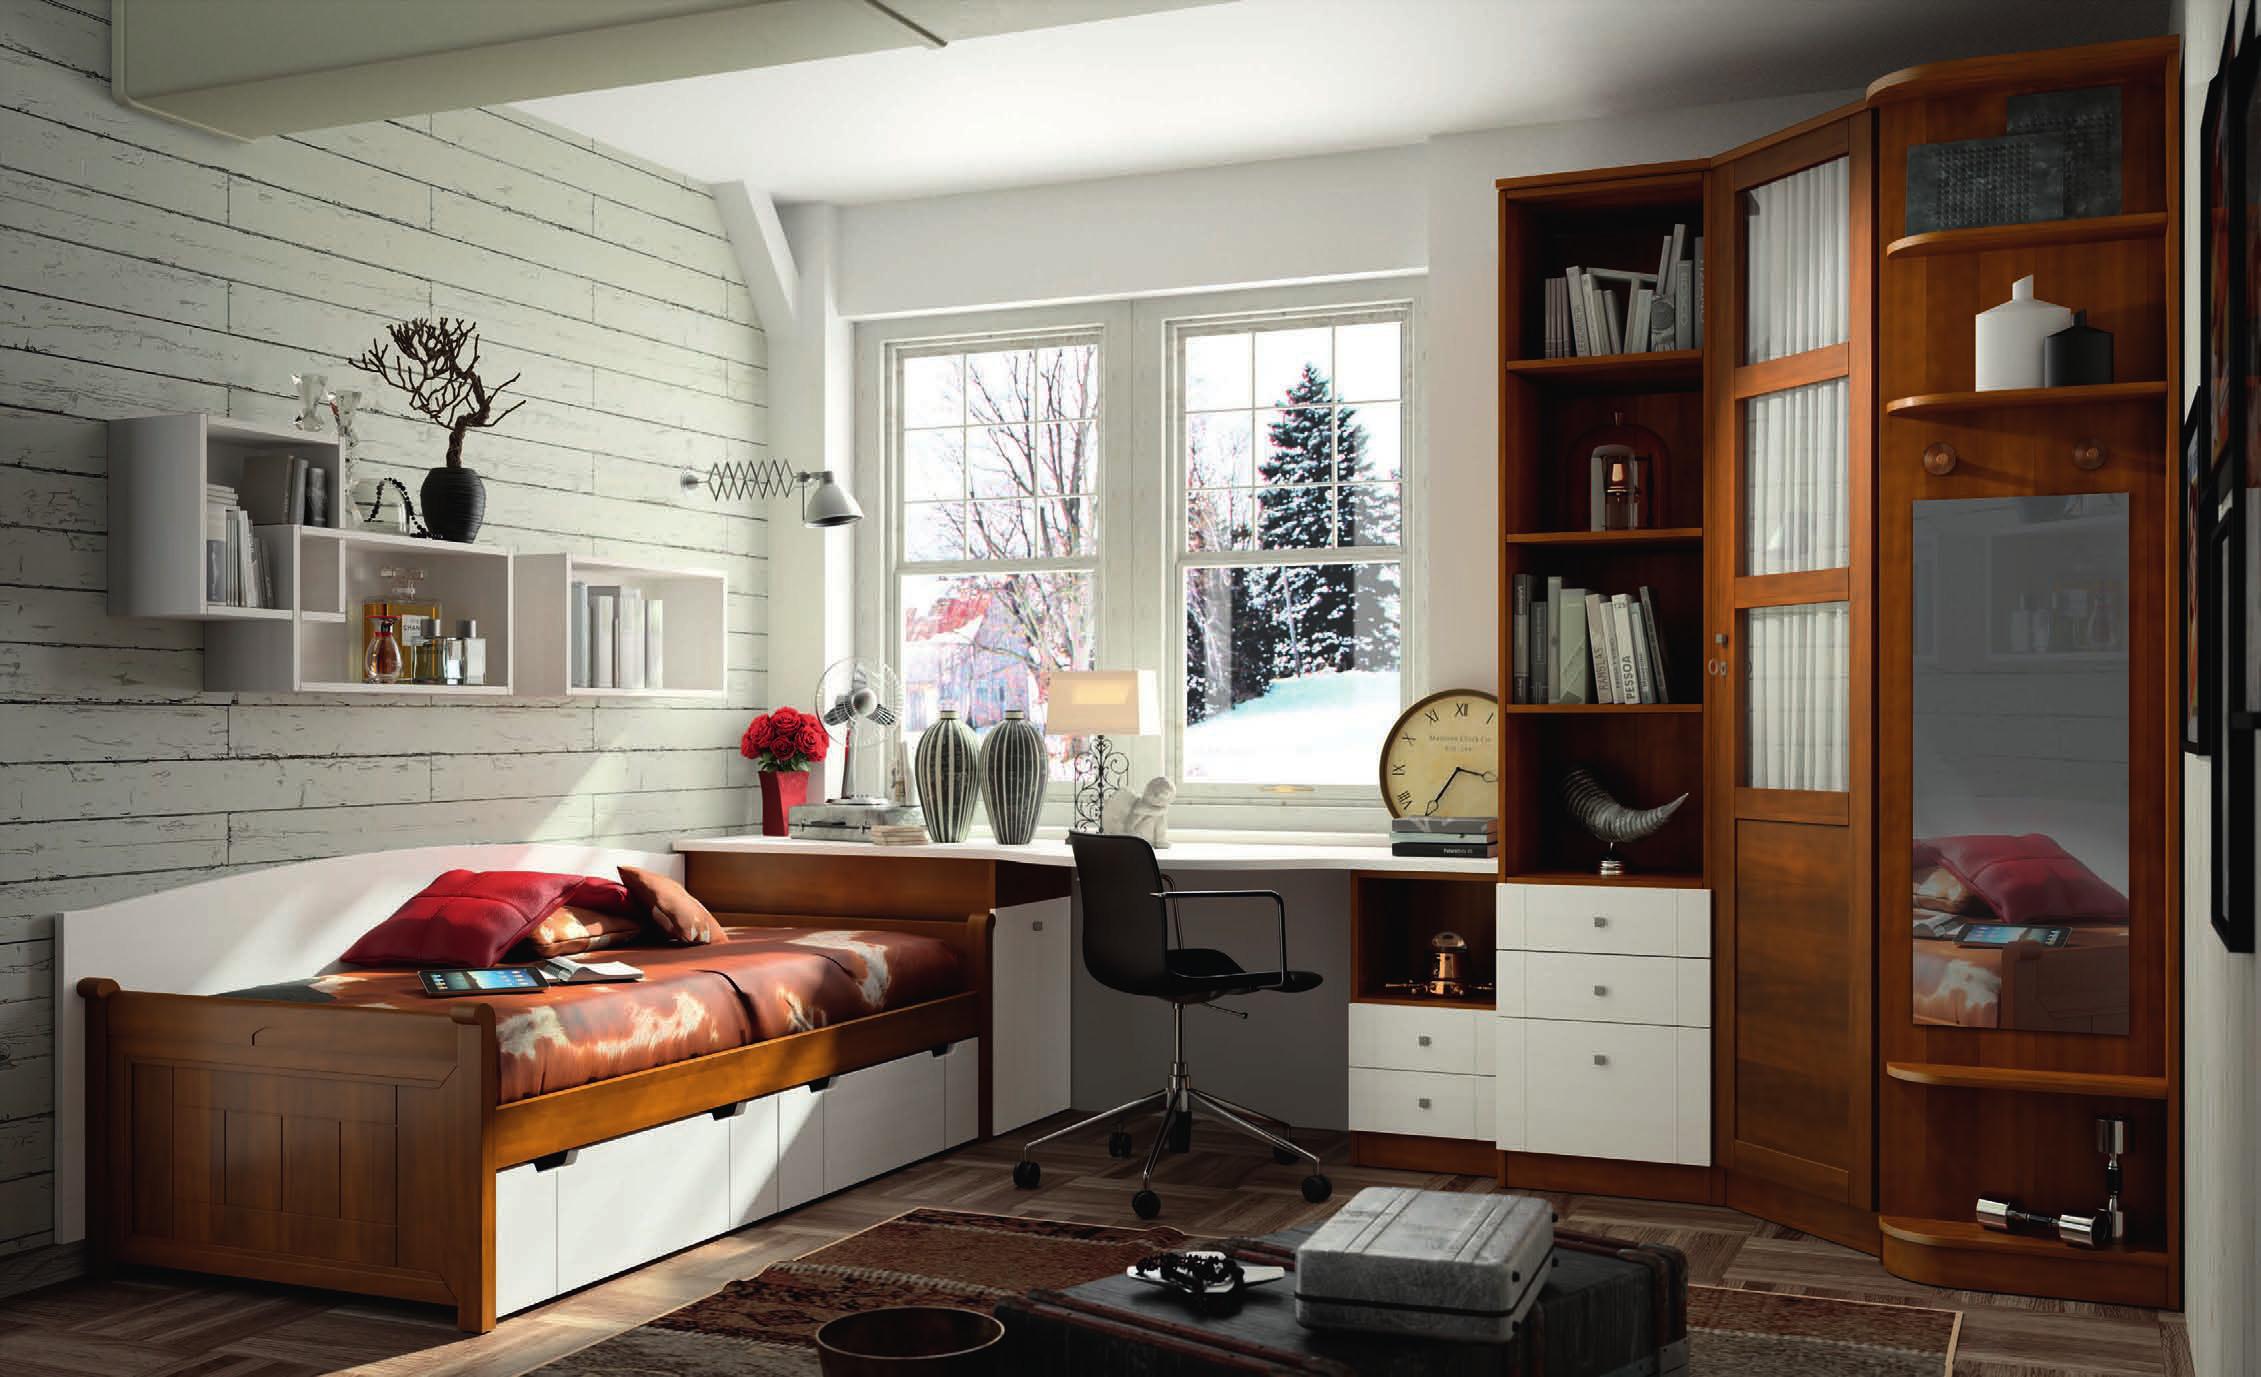 416-dormitorio-j-1